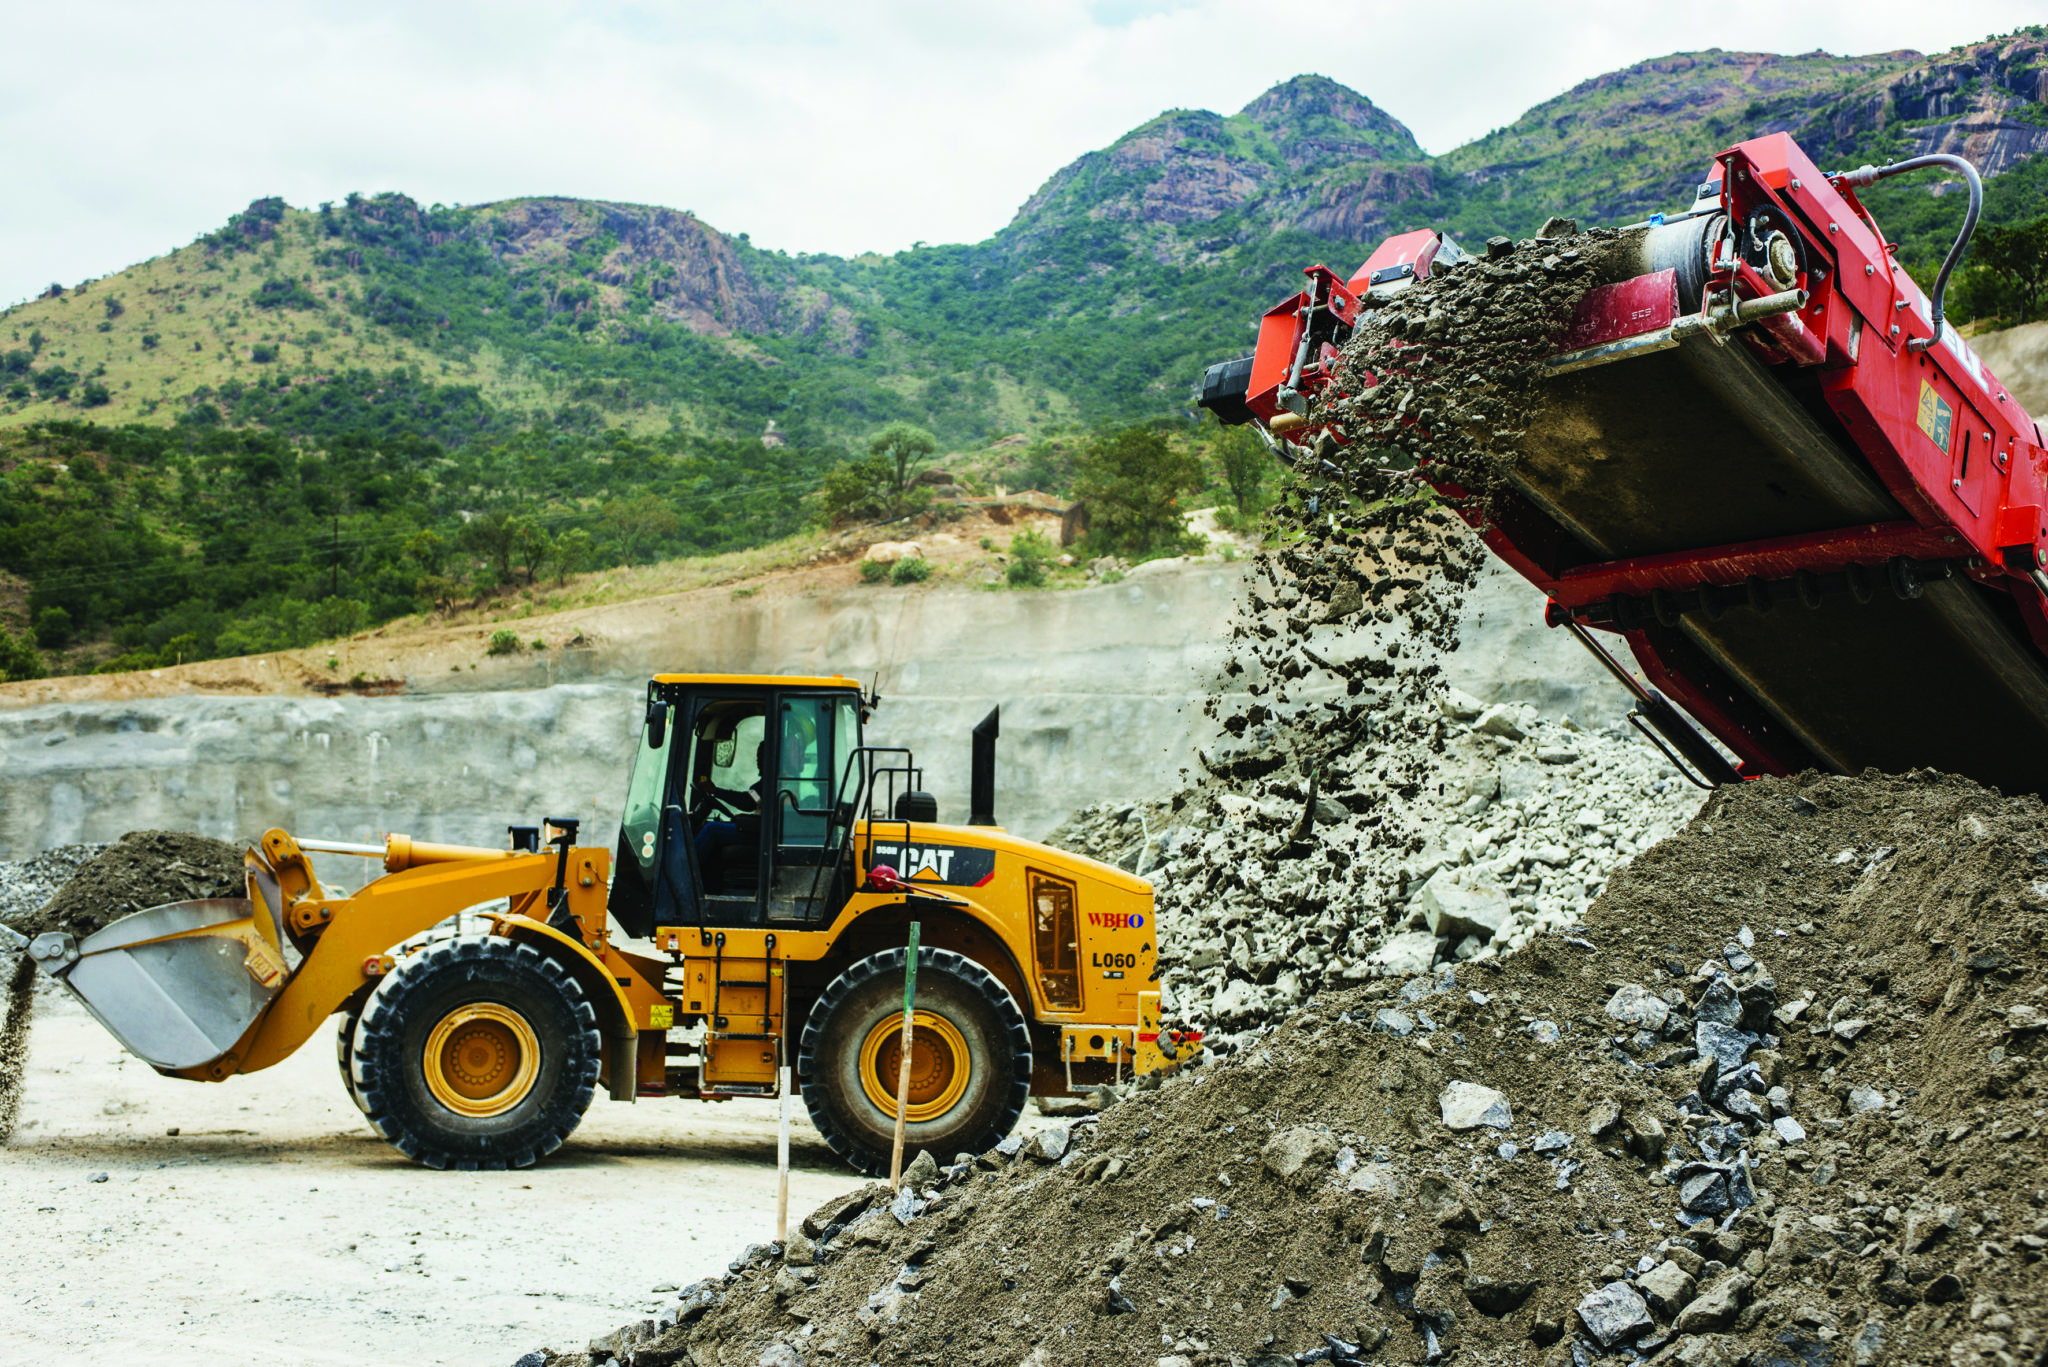 Precious Metals Excavation And Mining Operations At Northam Platinum Ltd Booysendal Mine